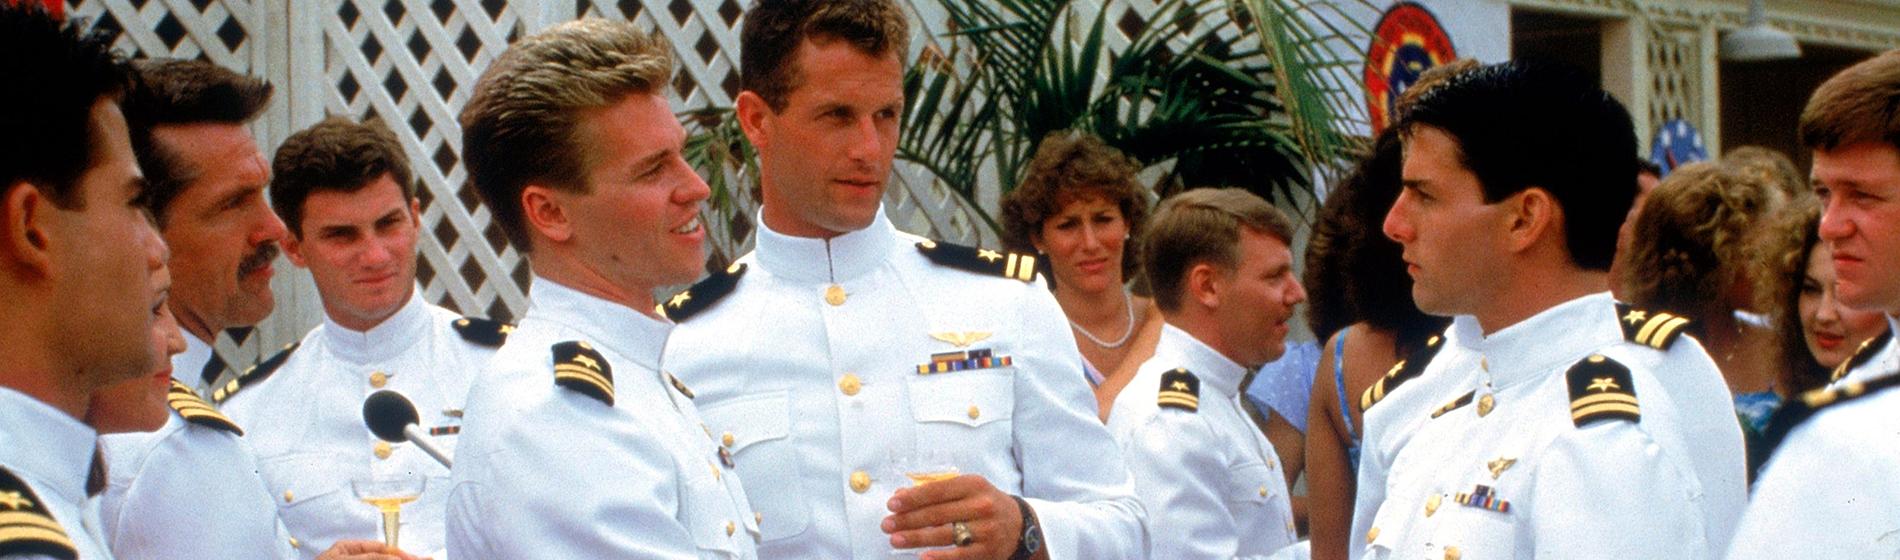 Top Gun Val Kilmer Rick Rossovich Tom Cruise